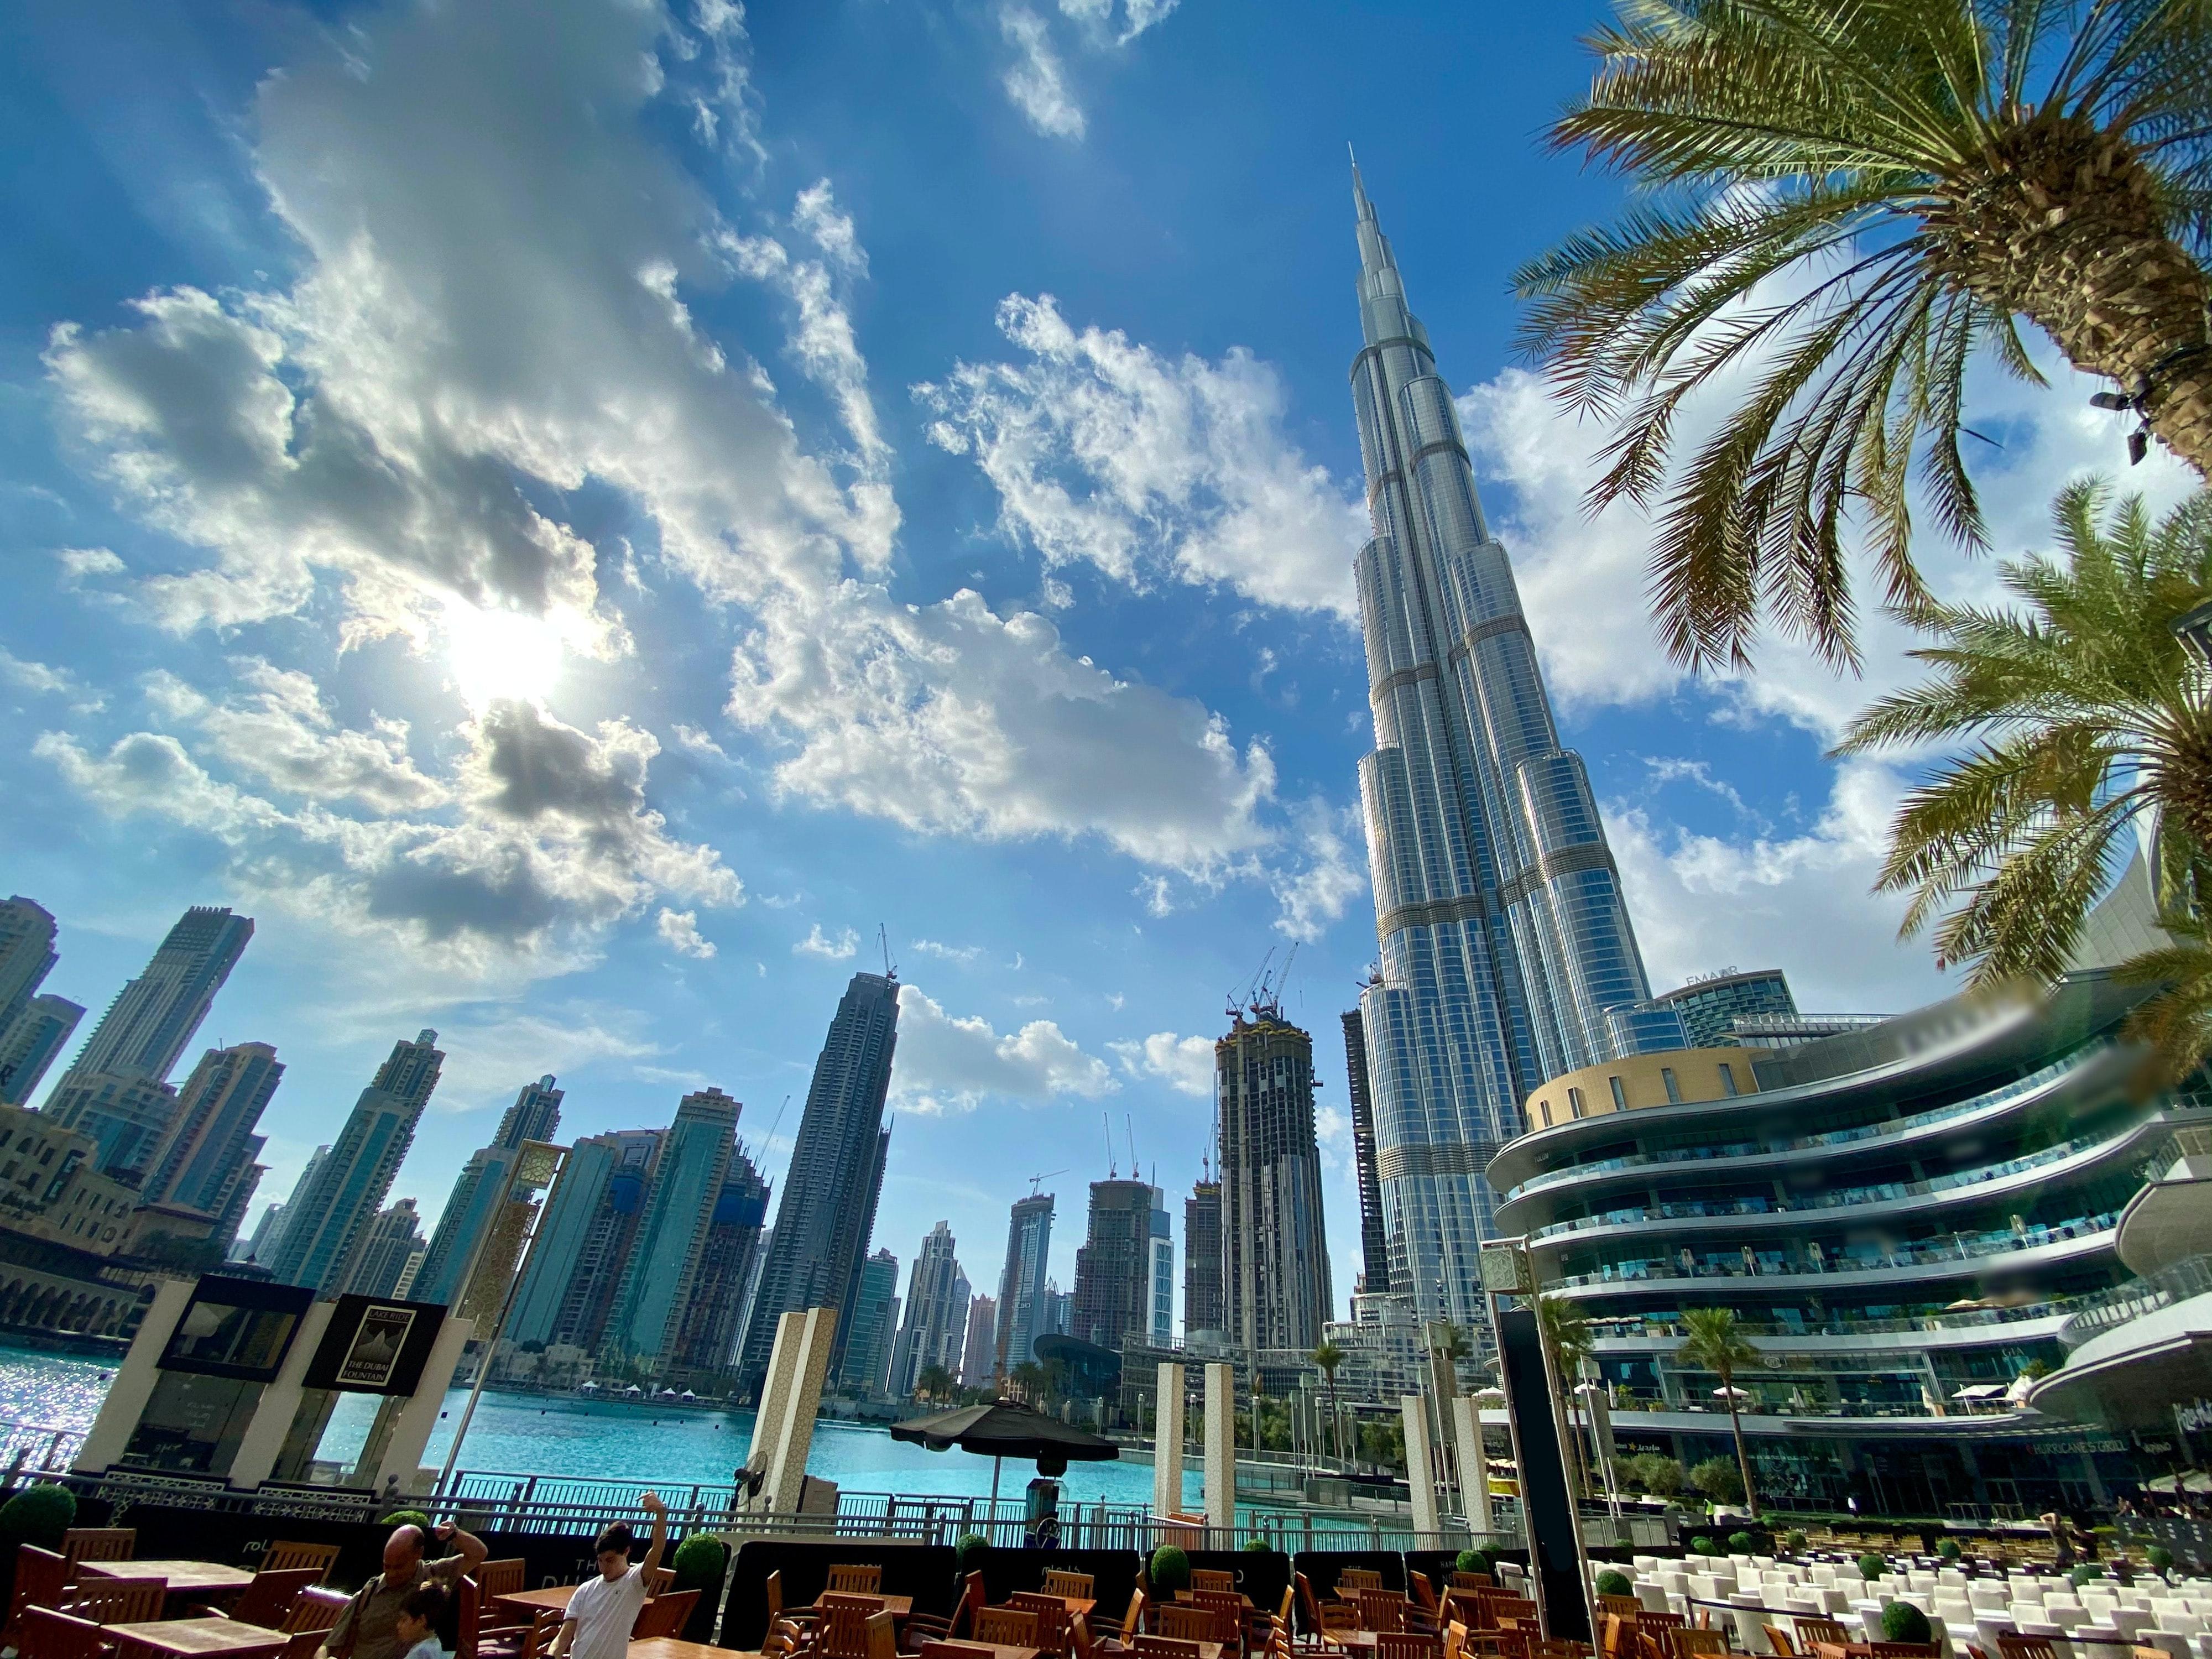 The image is of downtown Dubai, the Burj Khalifa, the Dubai fountains.